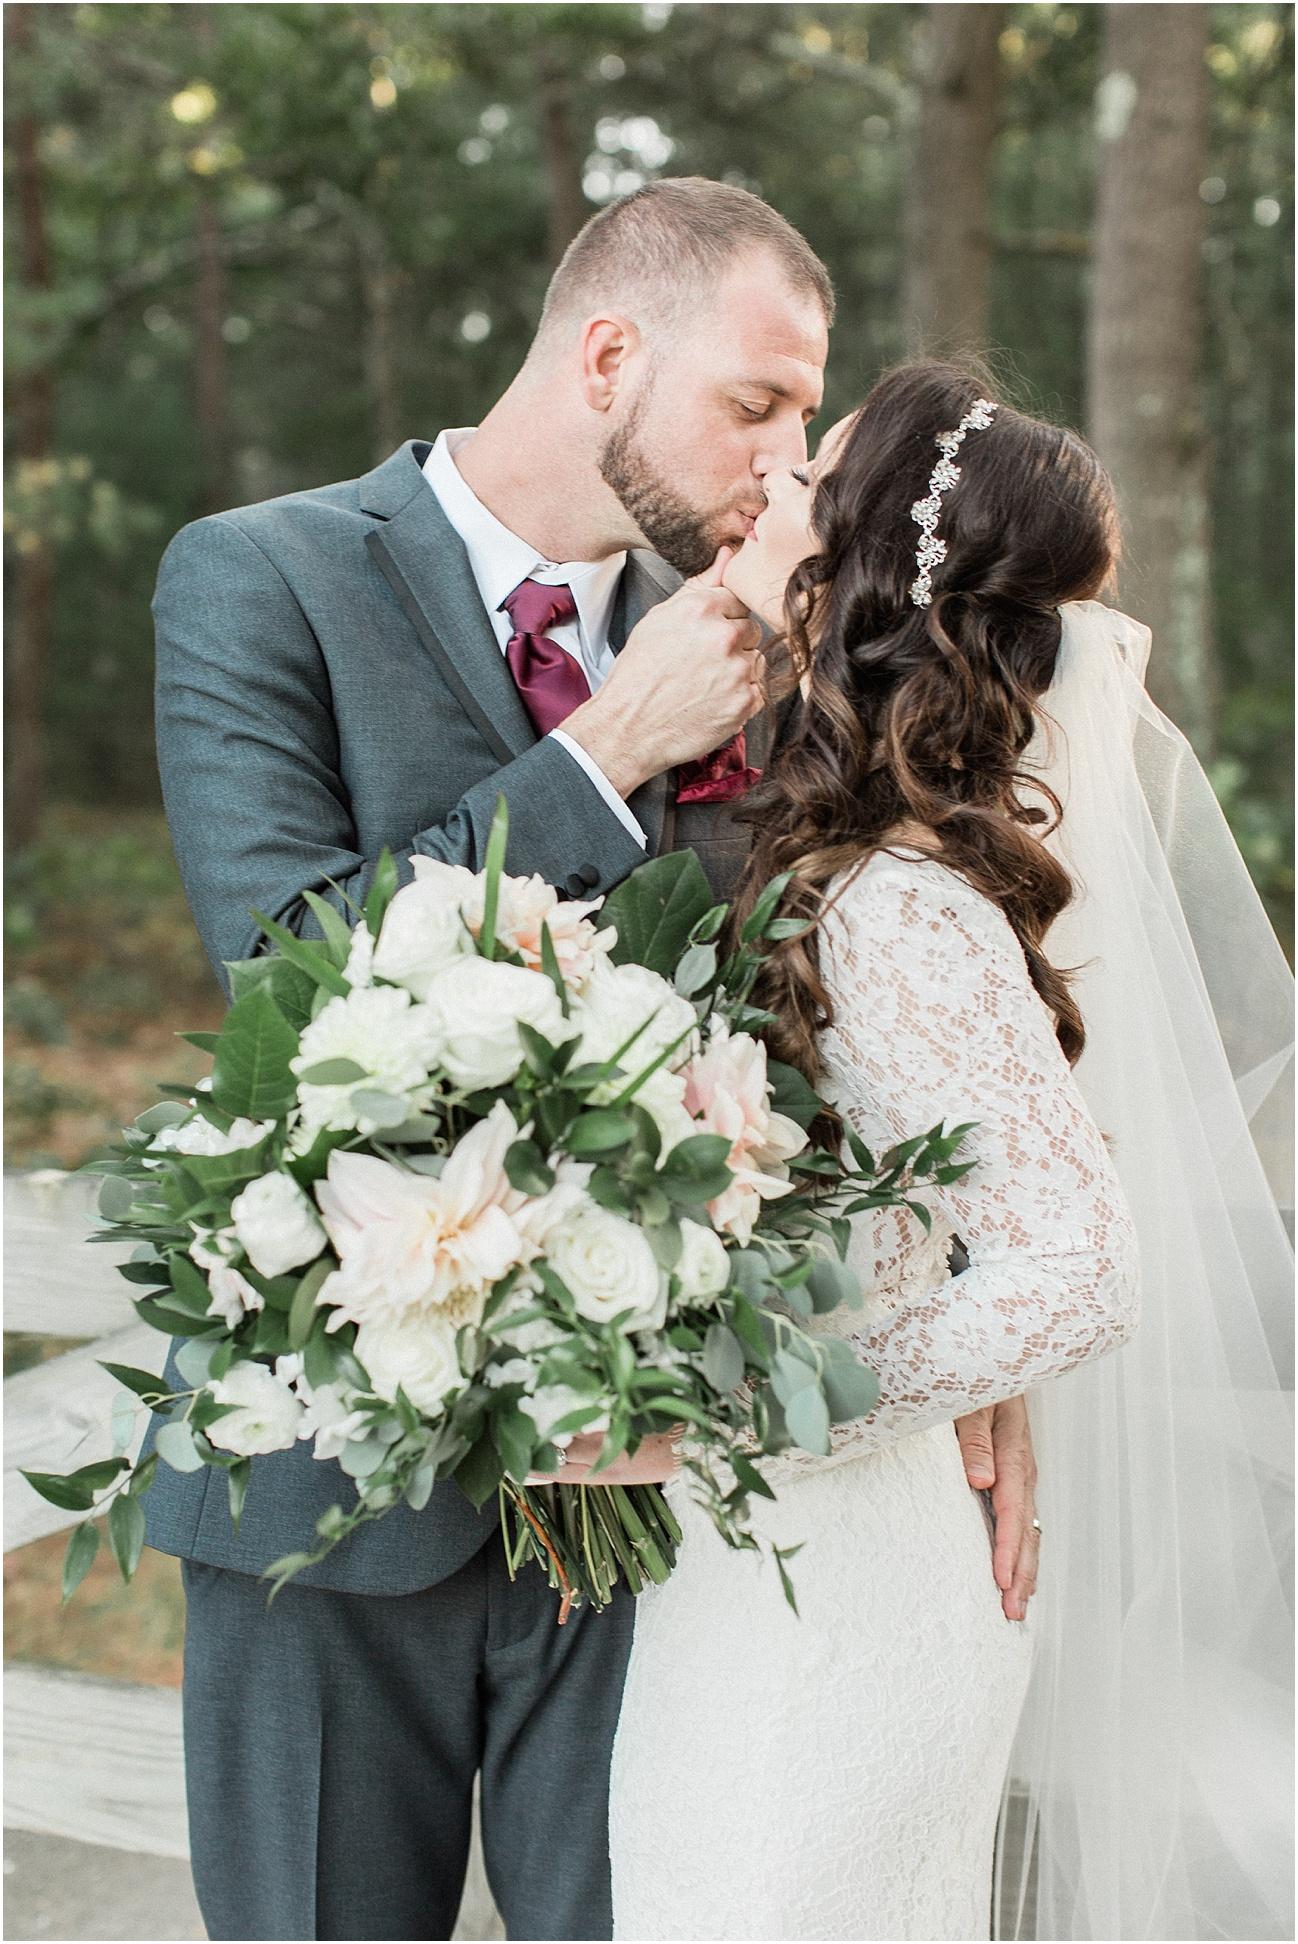 christina_frank_the_pavilion_at_pine_hills_fall_wine_cape_cod_boston_wedding_photographer_meredith_jane_photography_photo_1249.jpg